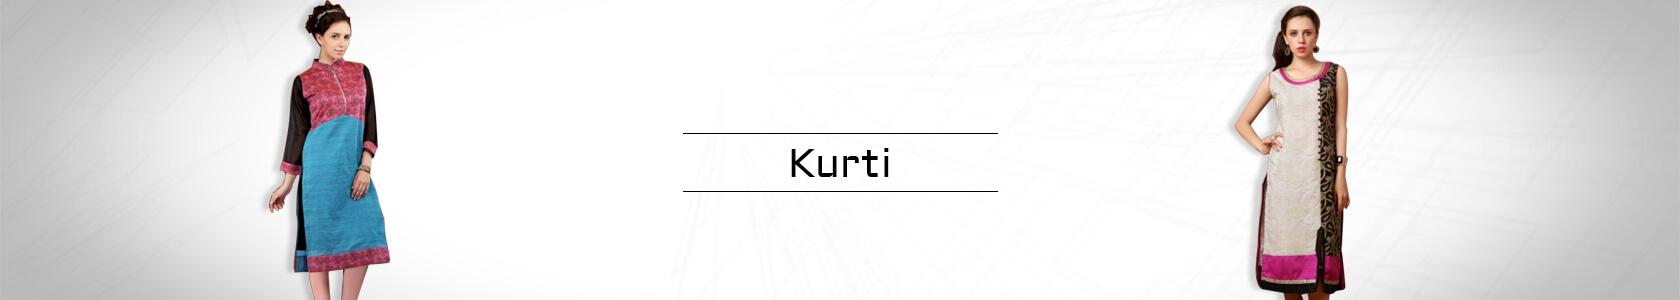 Kurti